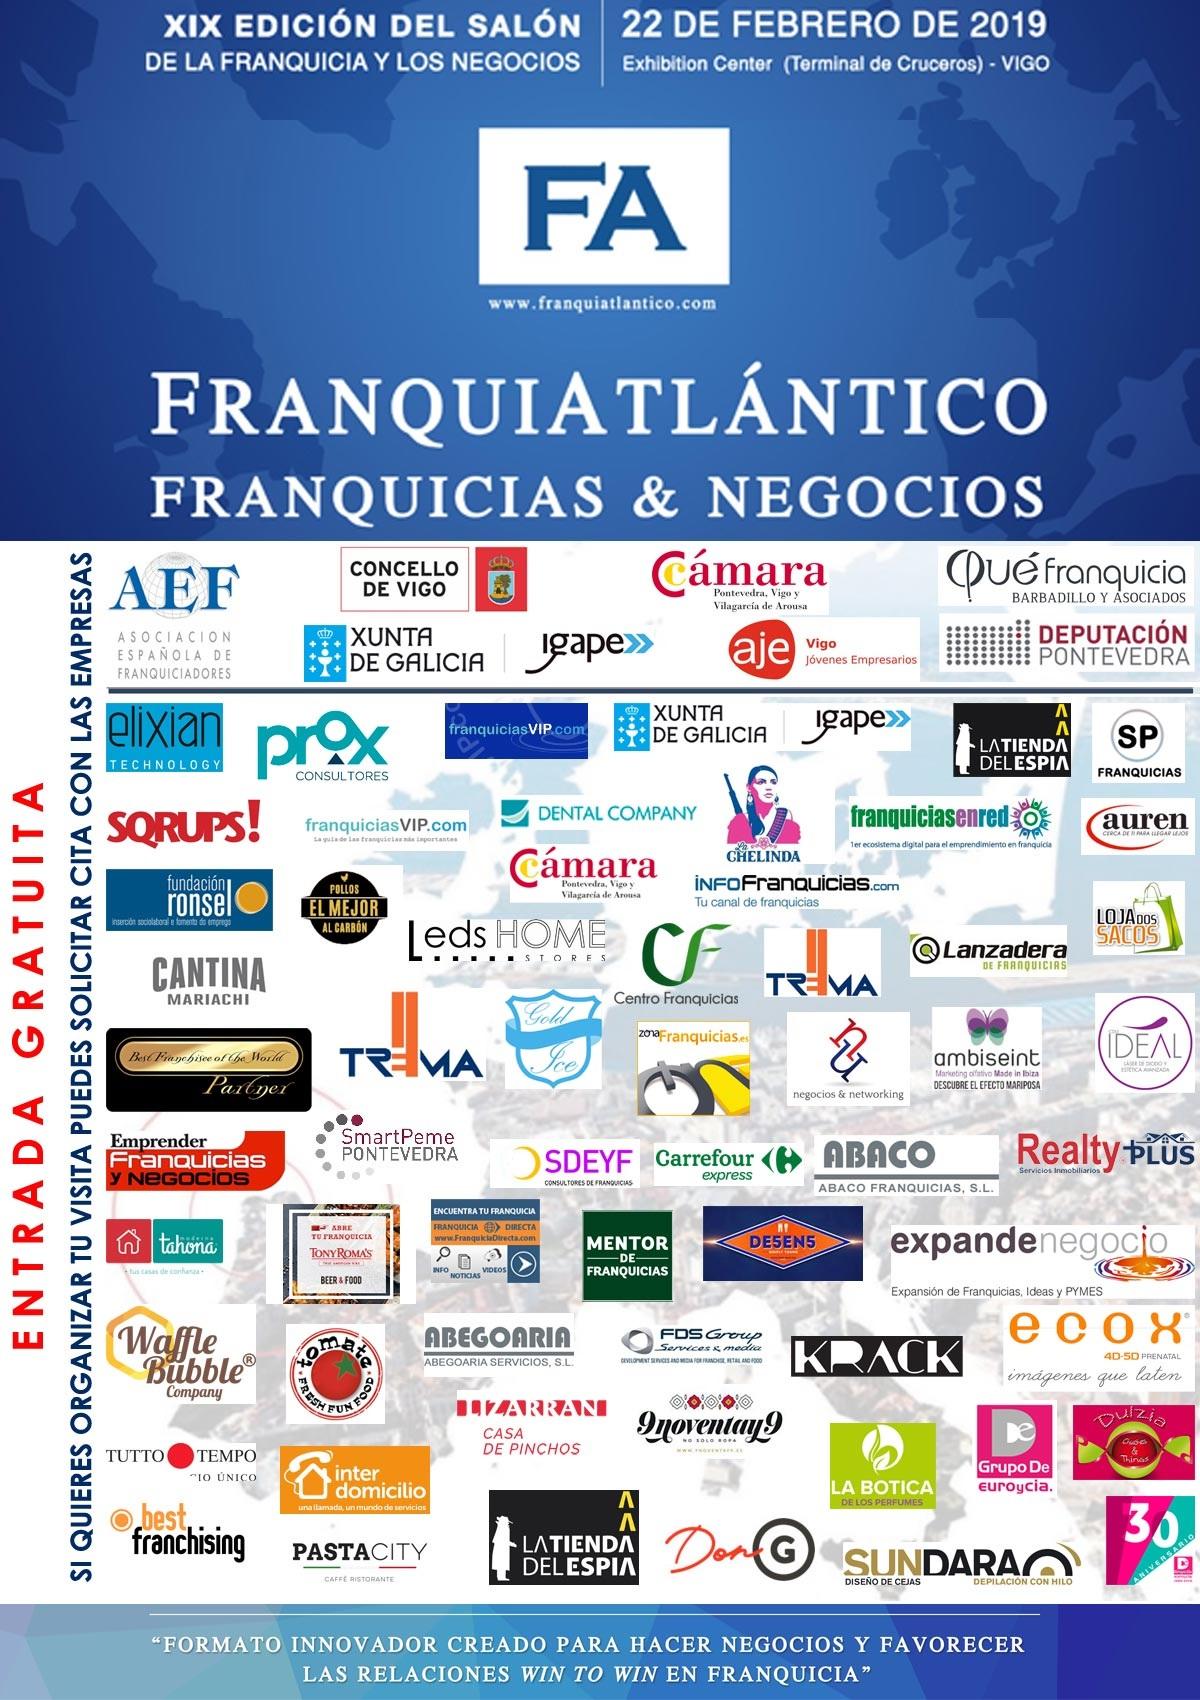 Franquiatlantico 2019 27-11-18